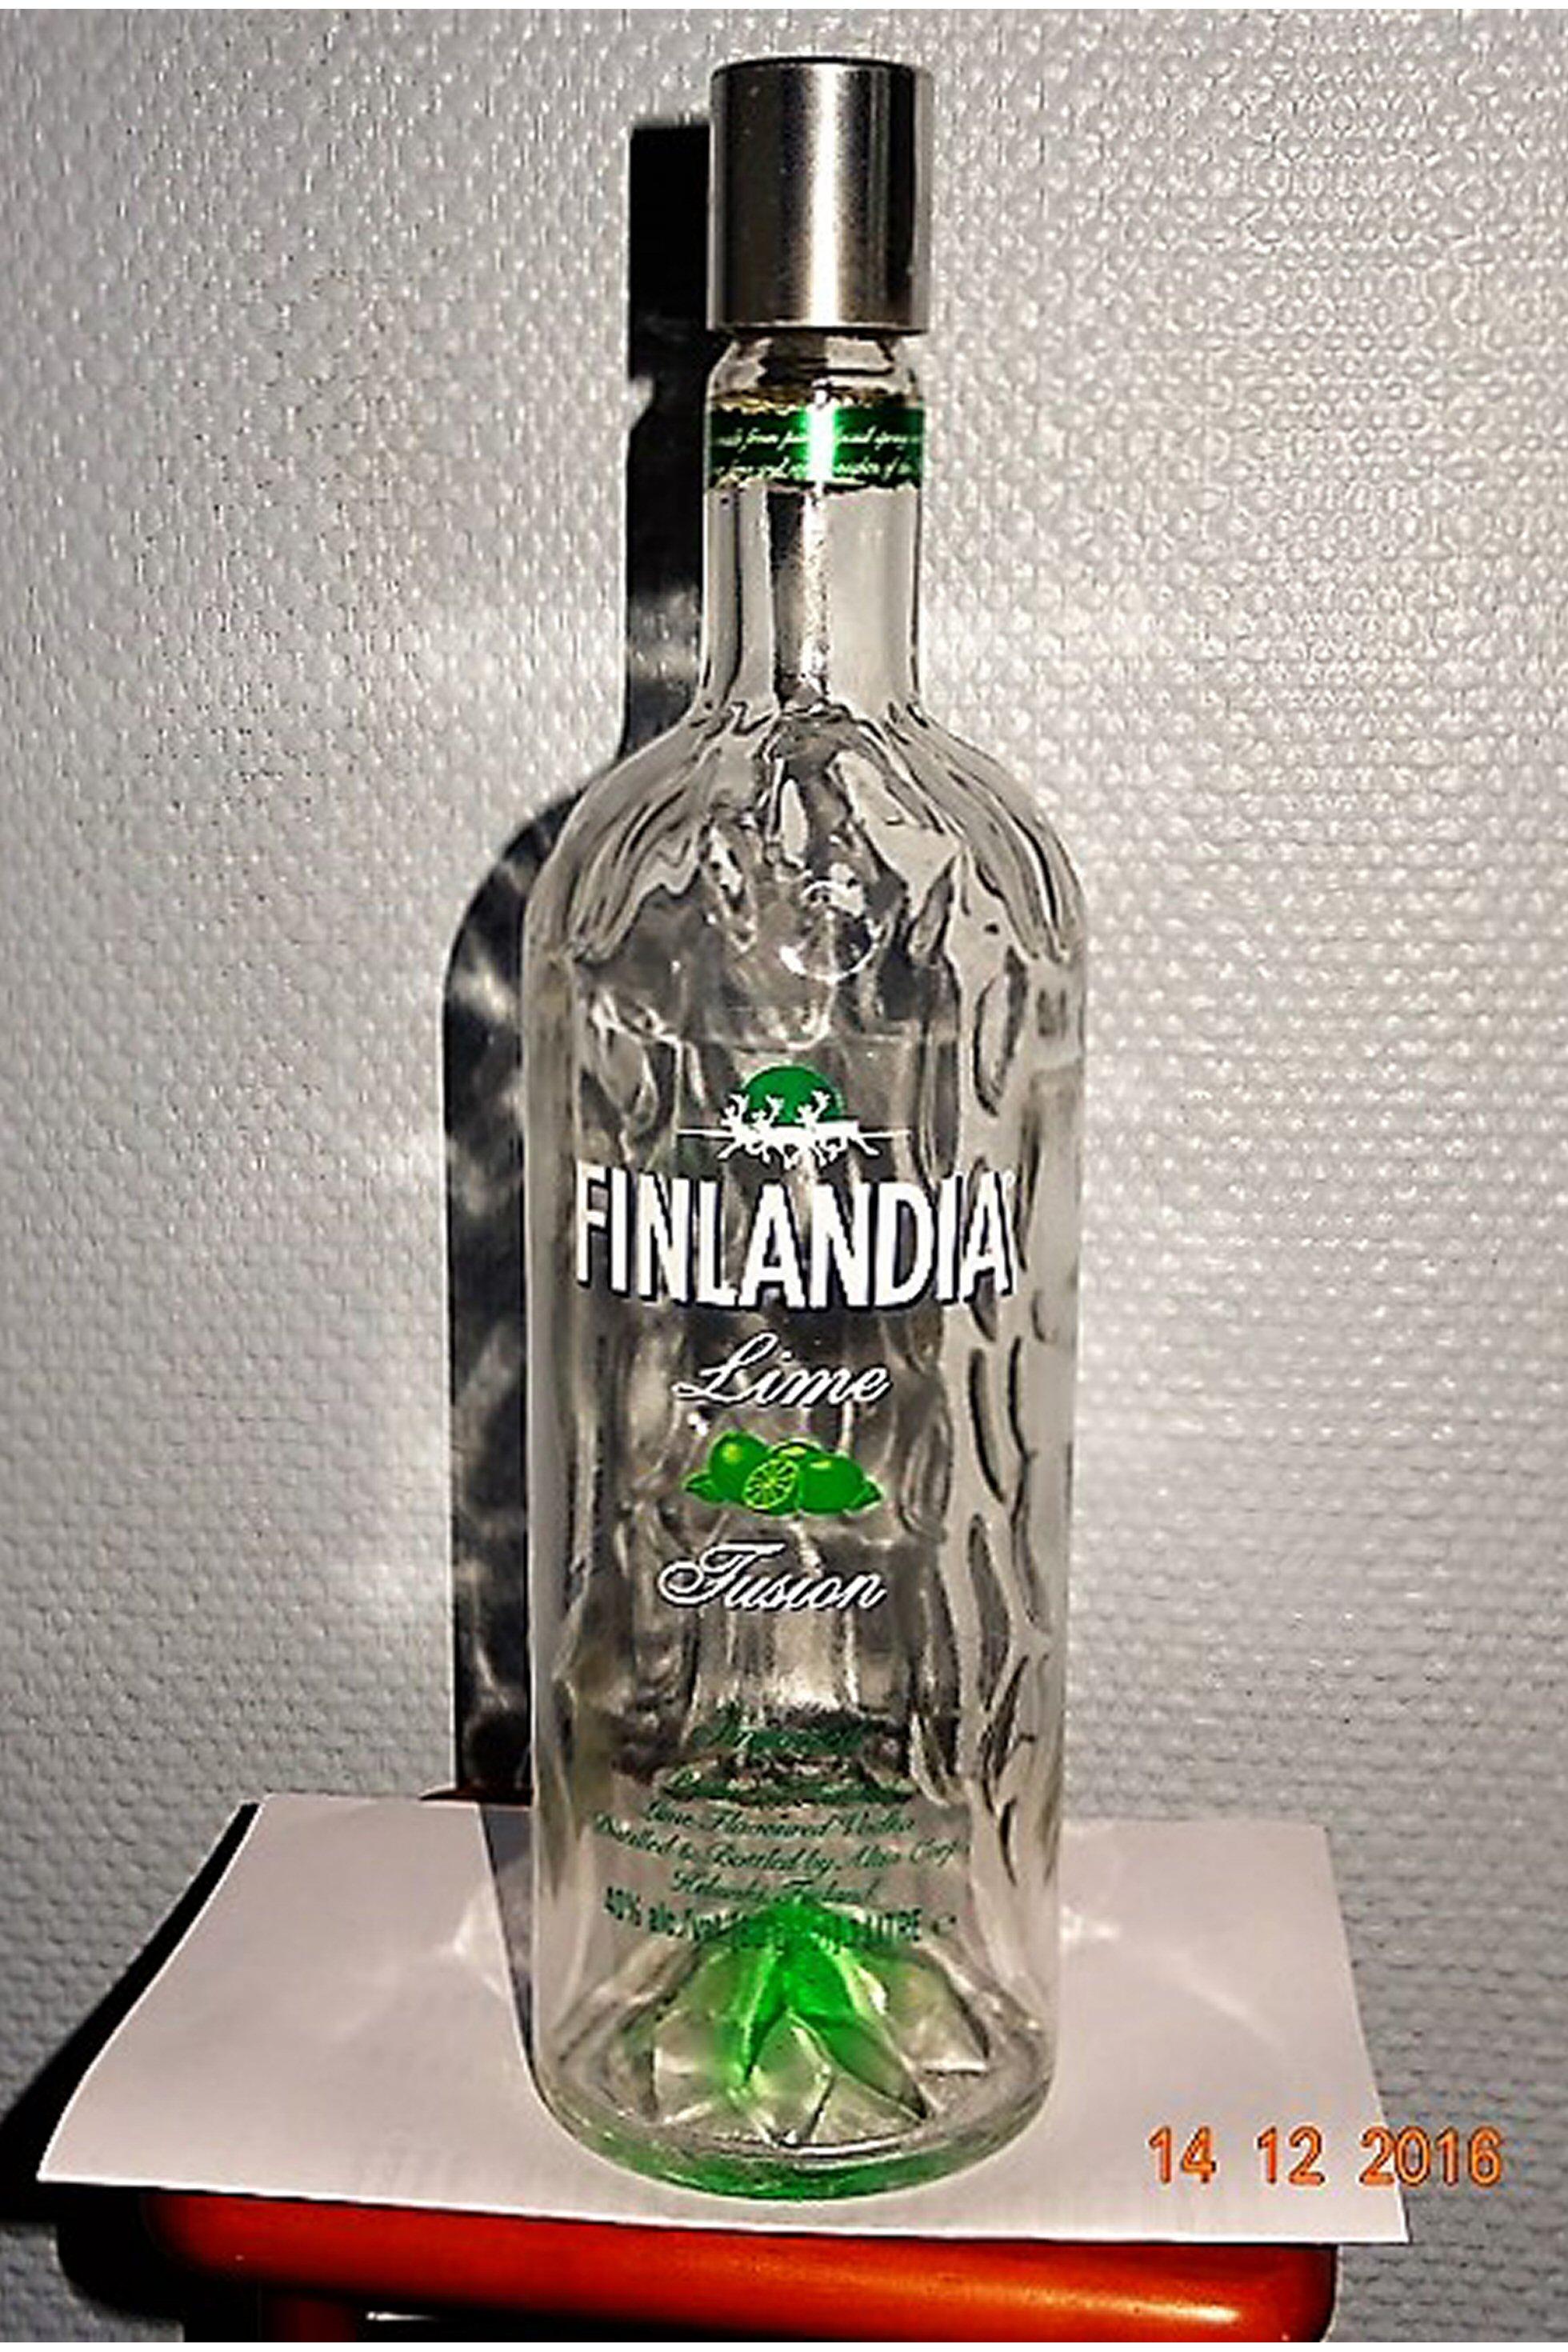 FINLANDIA LIME1L A.JPG